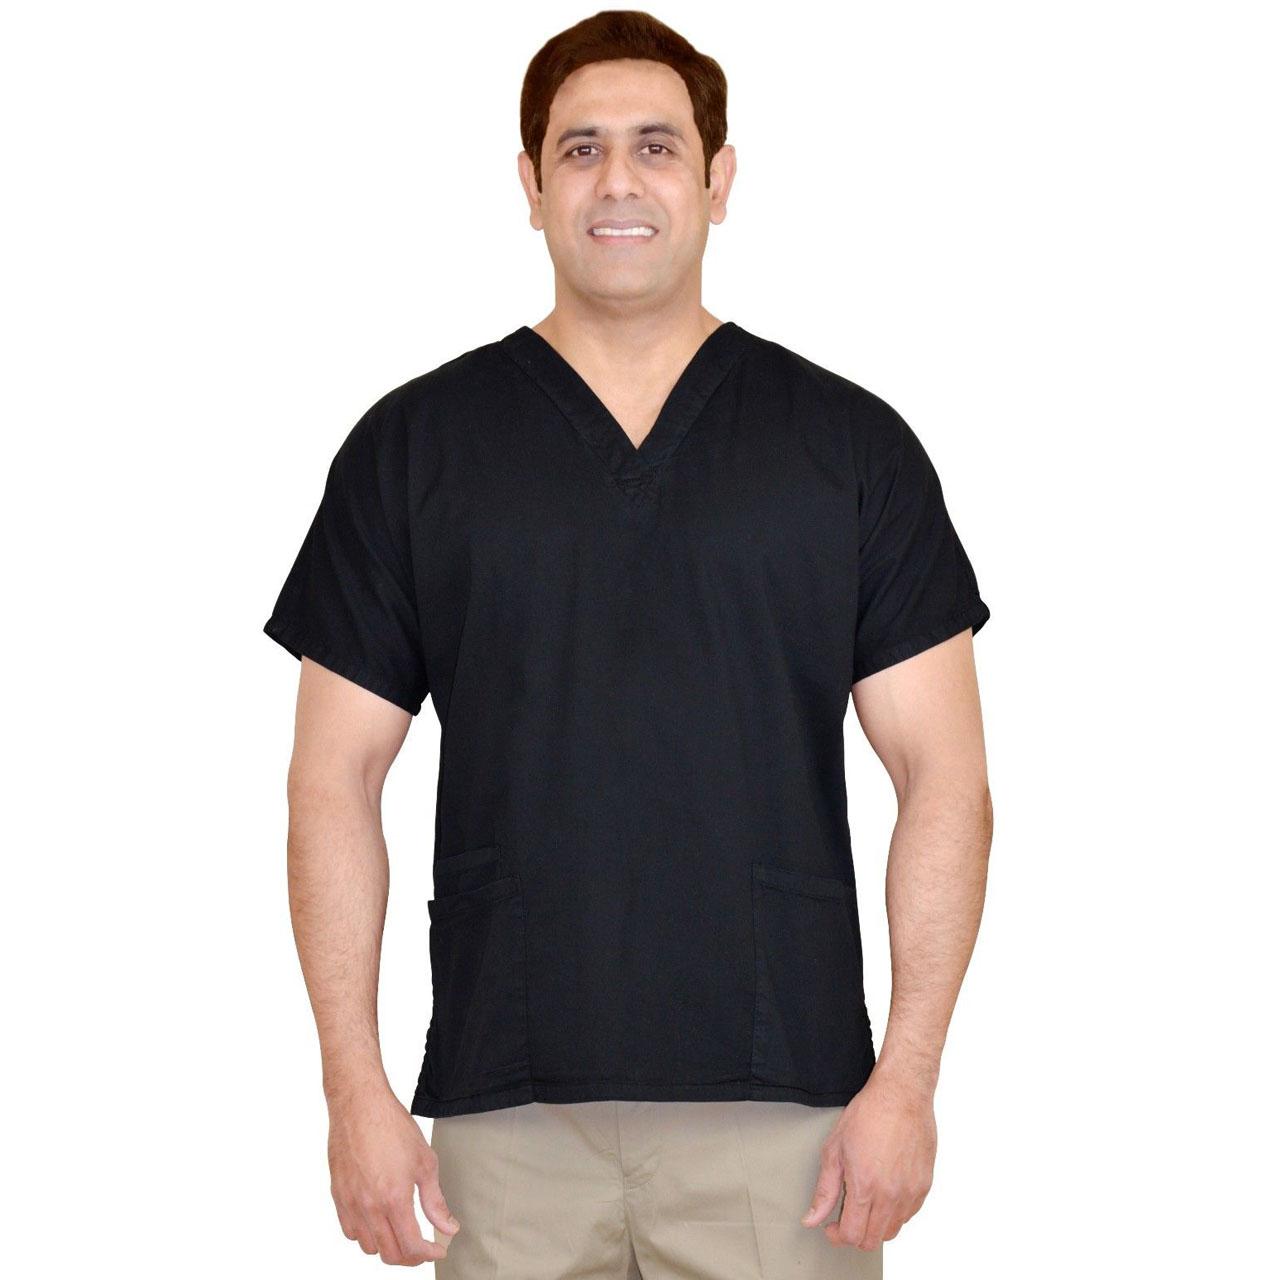 0a91f117dea Unisex Black Men/Women V-Neck Scrub Cotton Uniforms Medical Hospital  Nursing Shirt Top